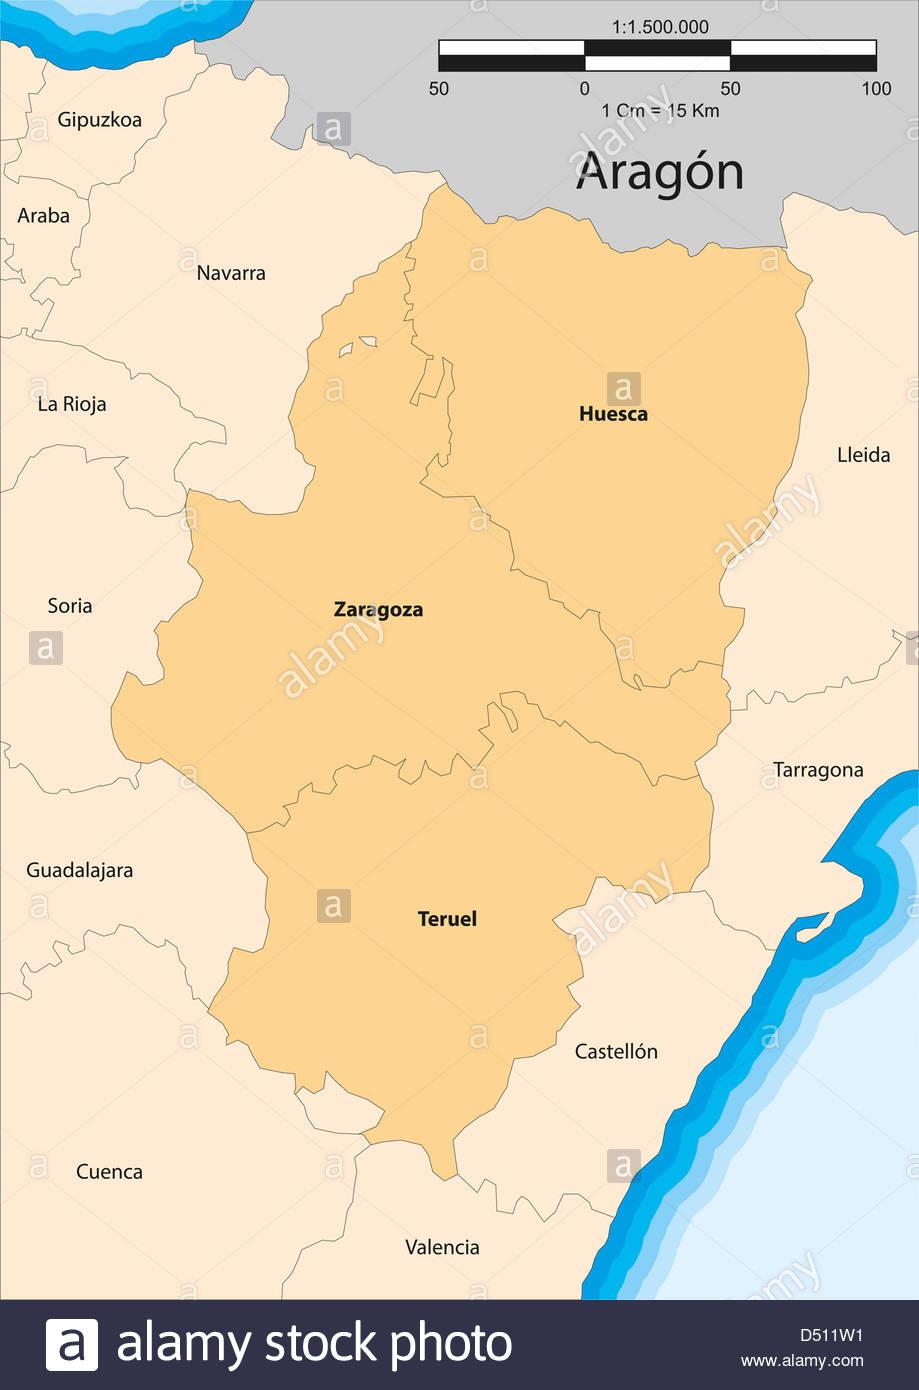 Vector Map Of The Autonomous Community Of Aragon Spain Stock Photo